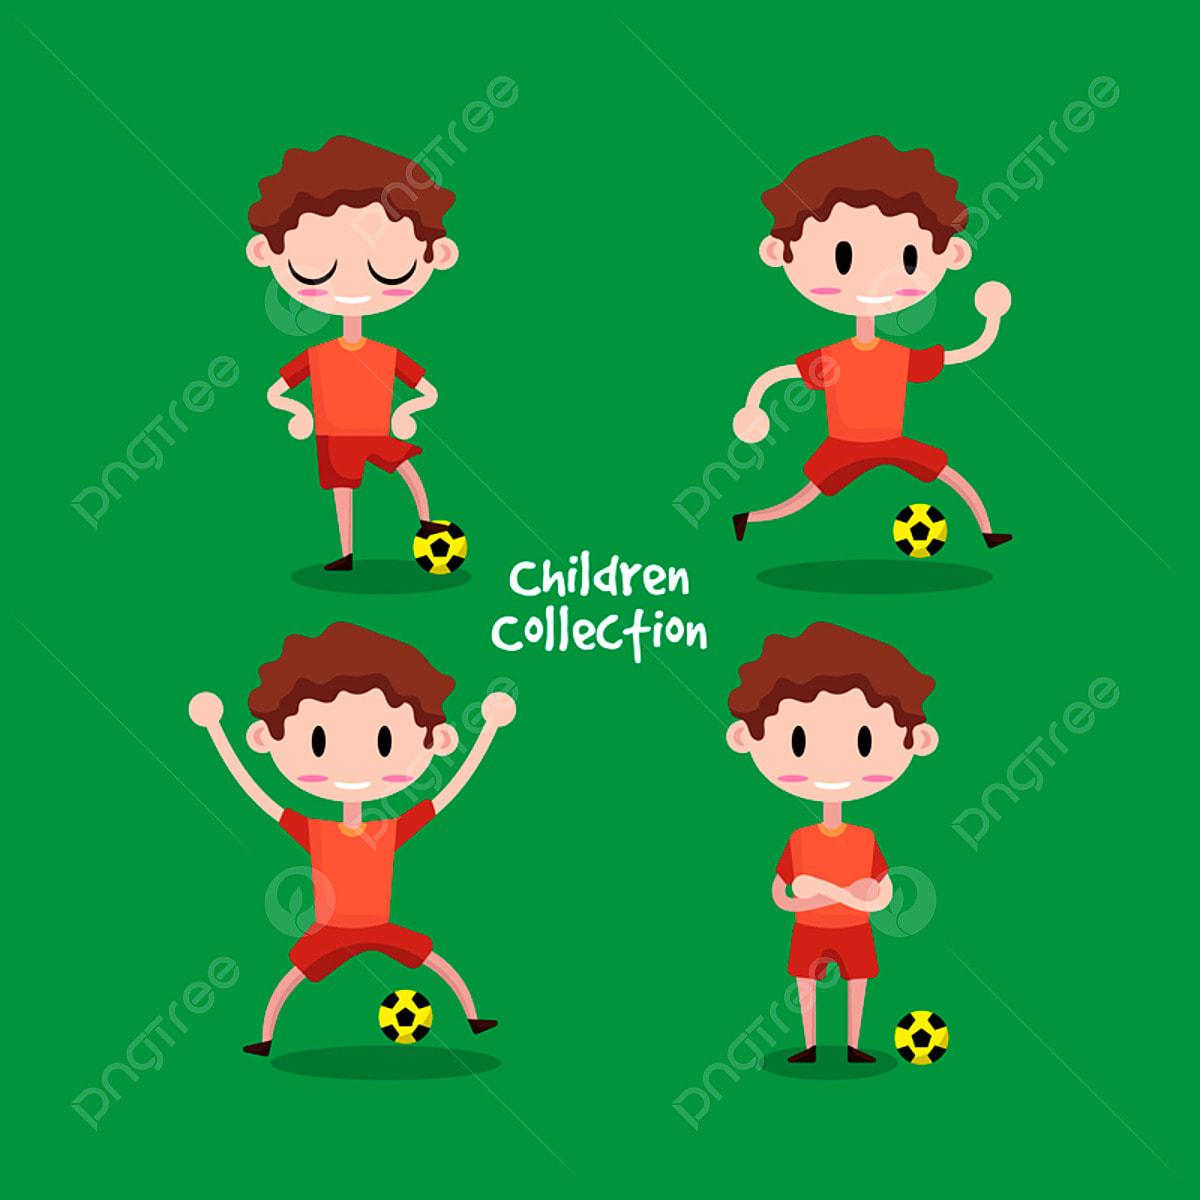 Suss Illustration Kinder Fussball Spielen Junge Fussball